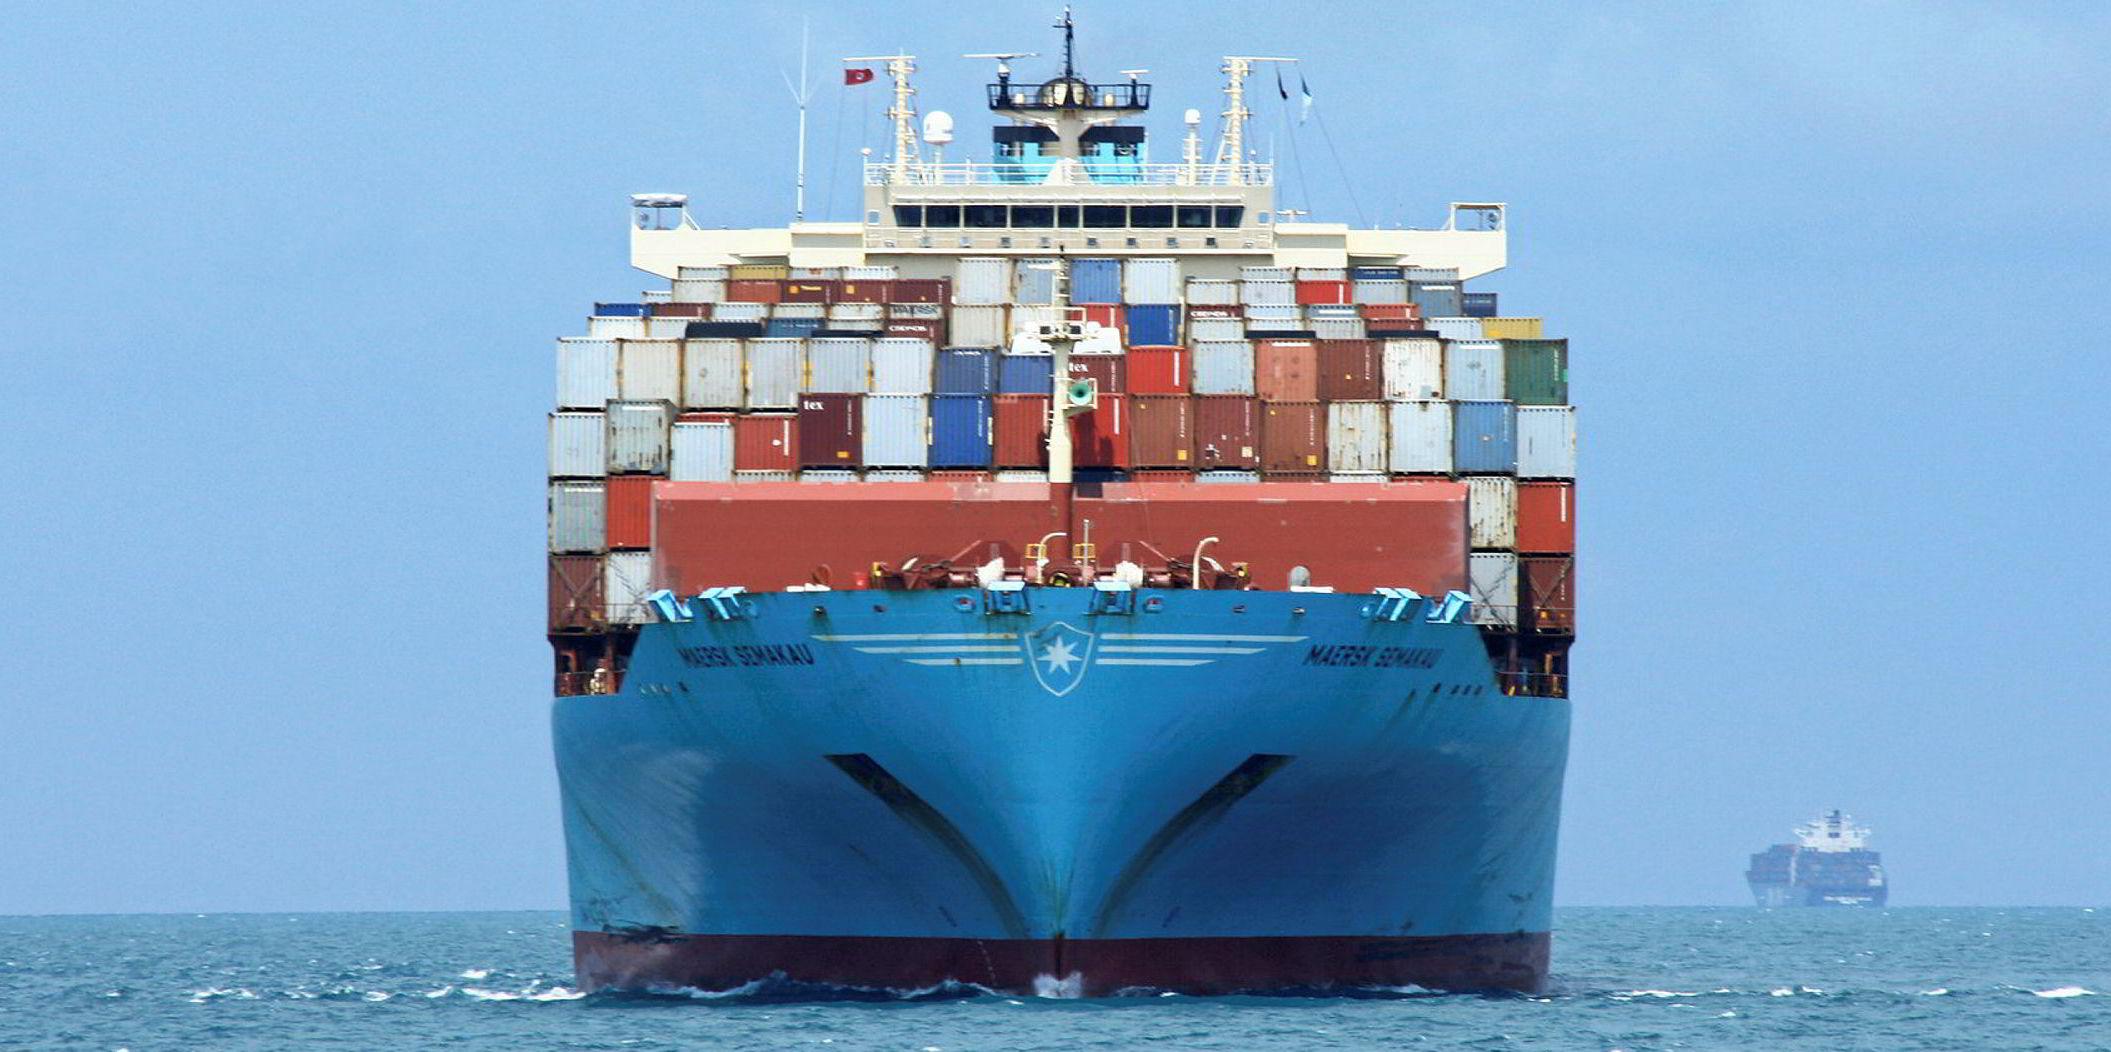 Maersk invests in return logistics start-up ZigZag